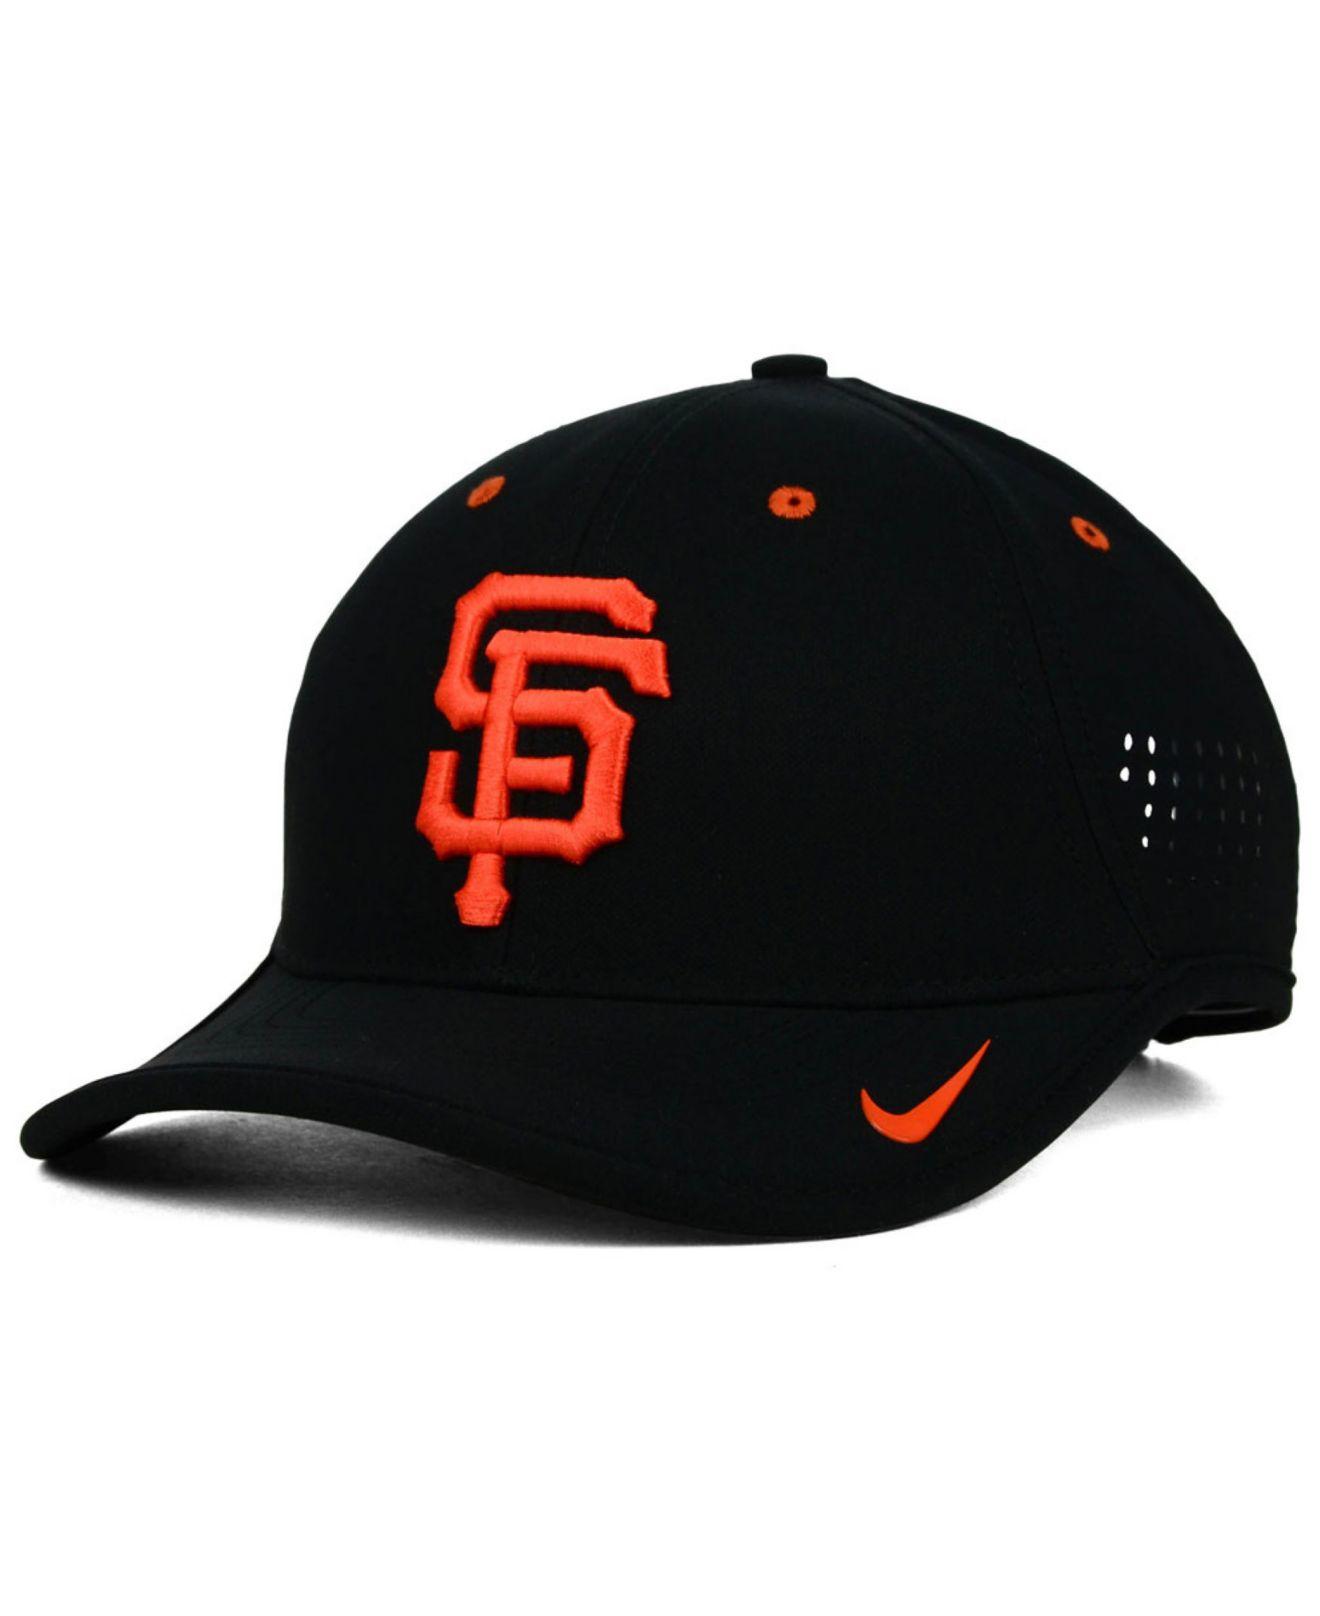 separation shoes df20b cad0b Nike San Francisco Giants Vapor Swoosh Adjustable Cap in Black for ...